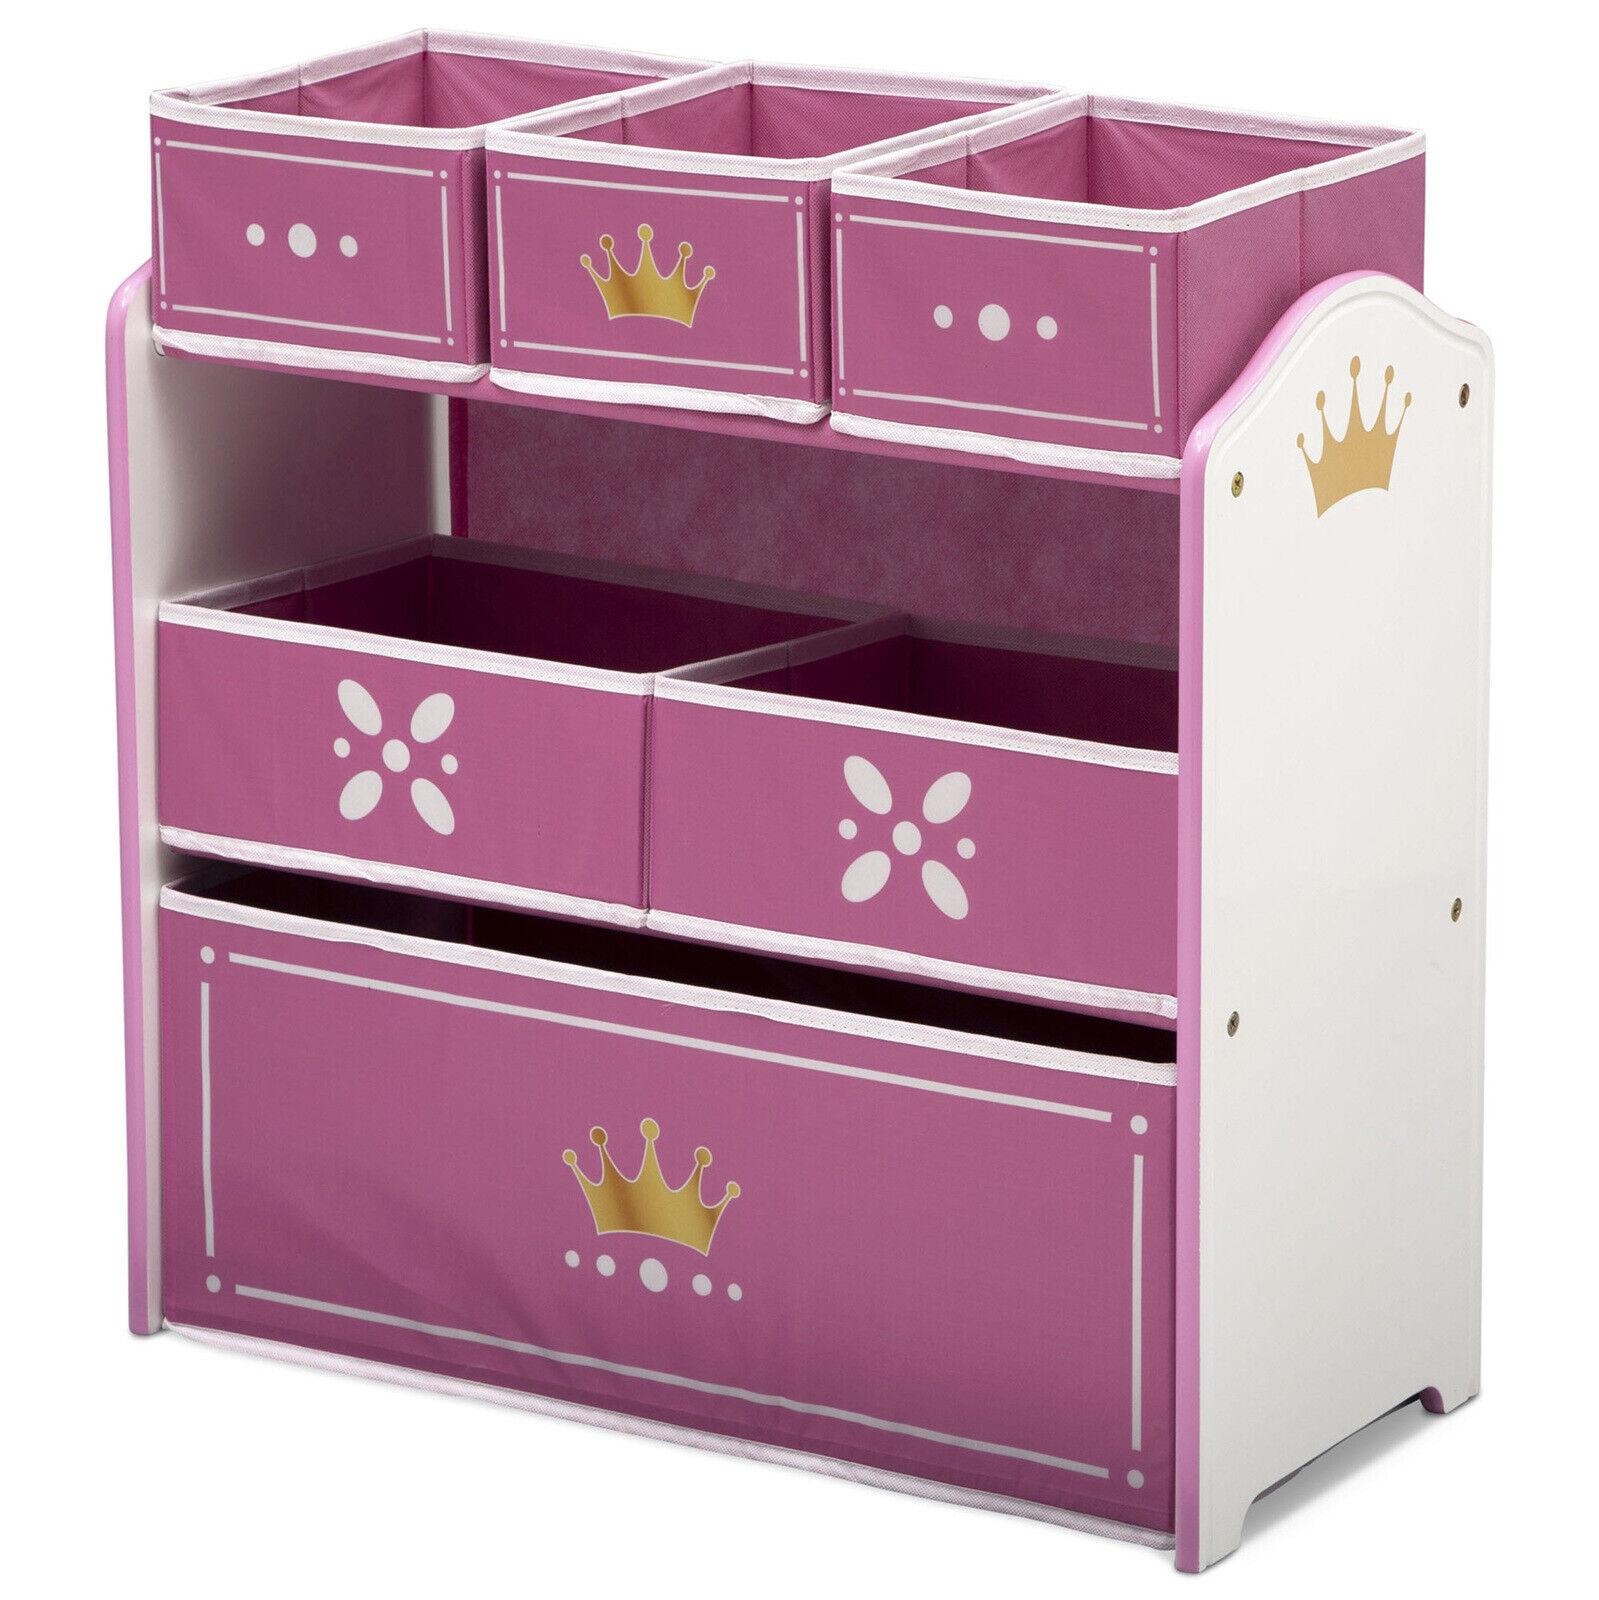 Multi-Bin Toy Storage Organizer Princess Crown Kids Girl Toy